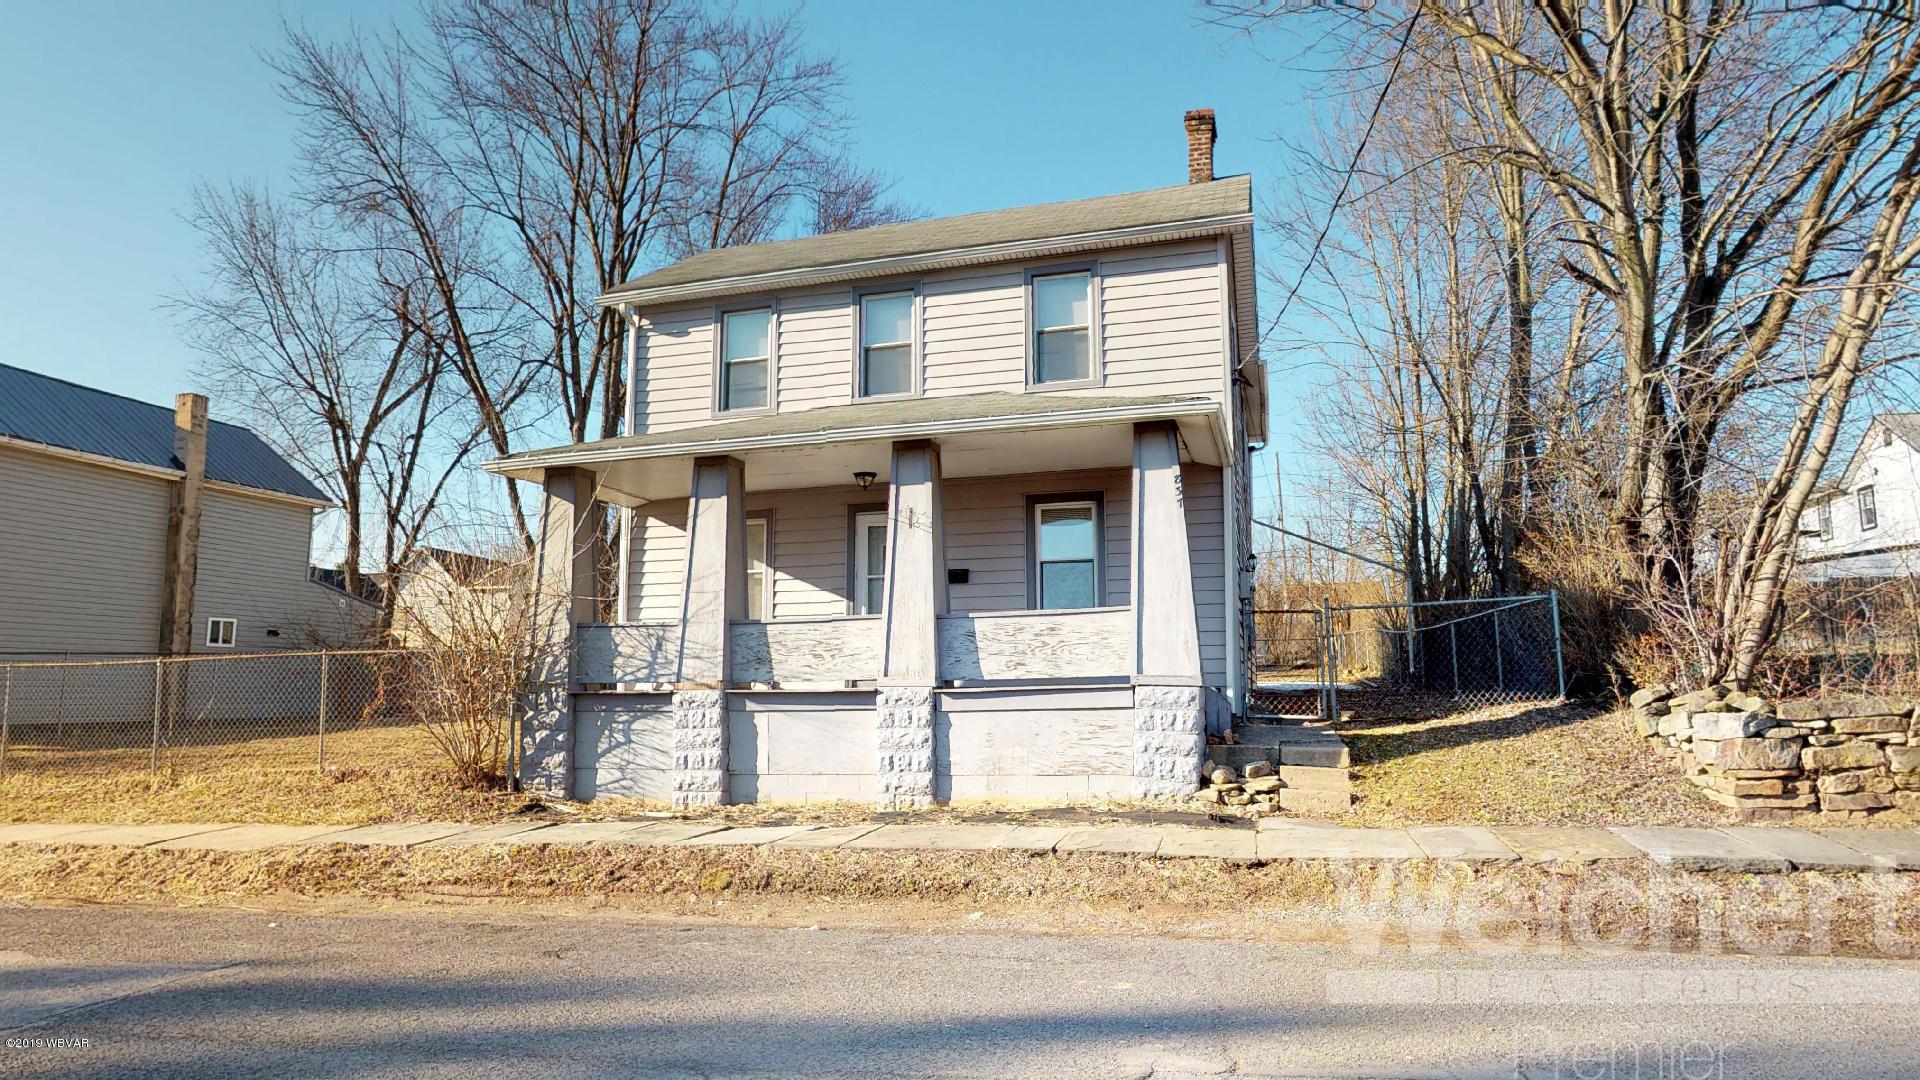 837 WILSON STREET,Williamsport,PA 17701,3 Bedrooms Bedrooms,2 BathroomsBathrooms,Residential,WILSON,WB-86639